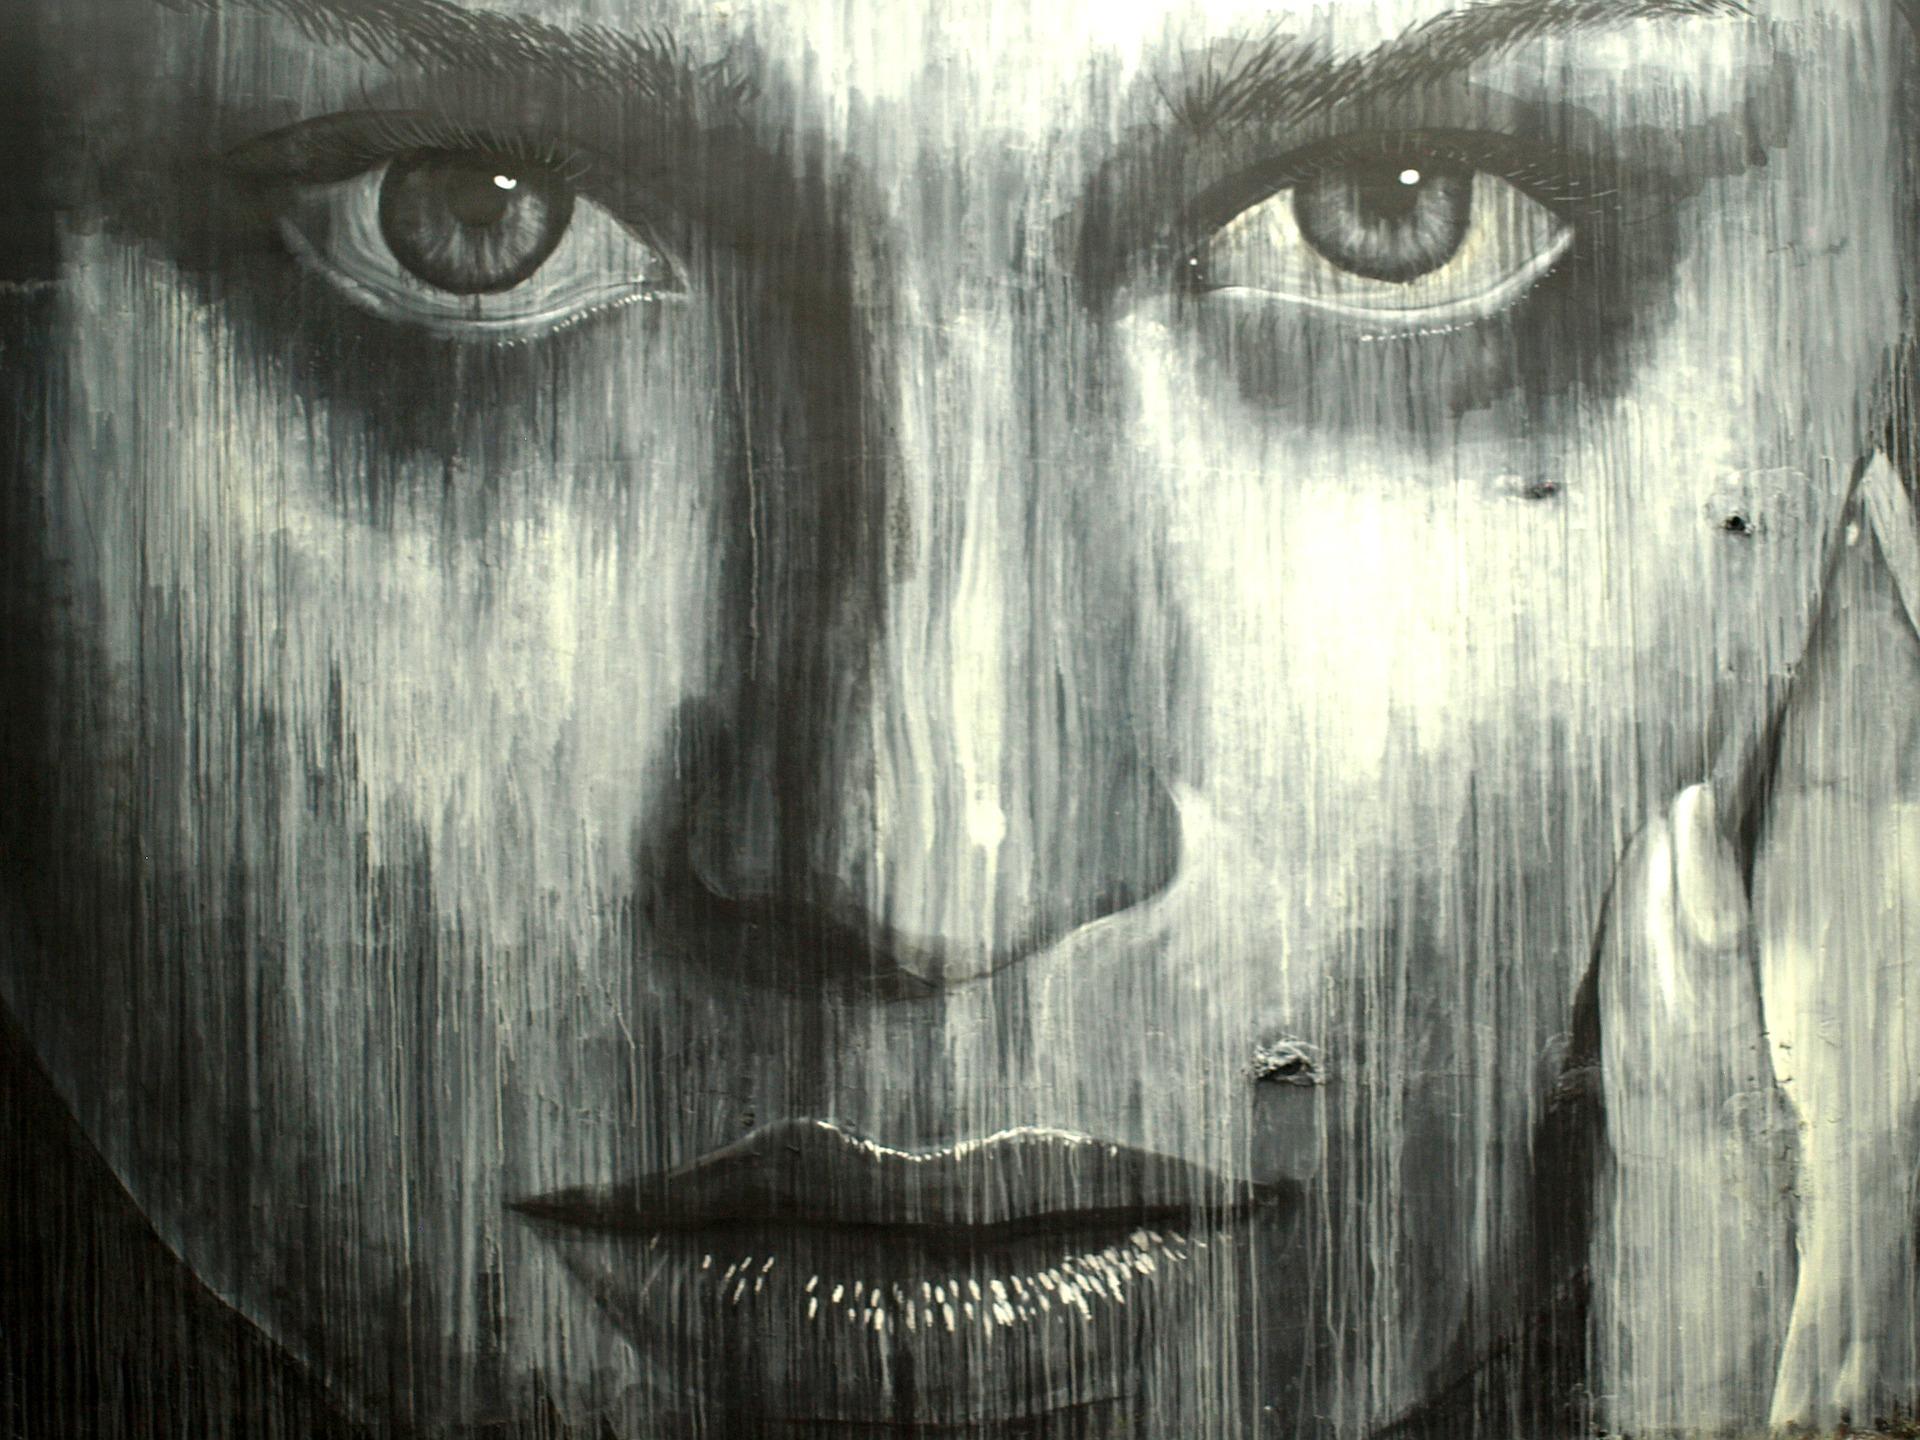 street-art-827098_1920